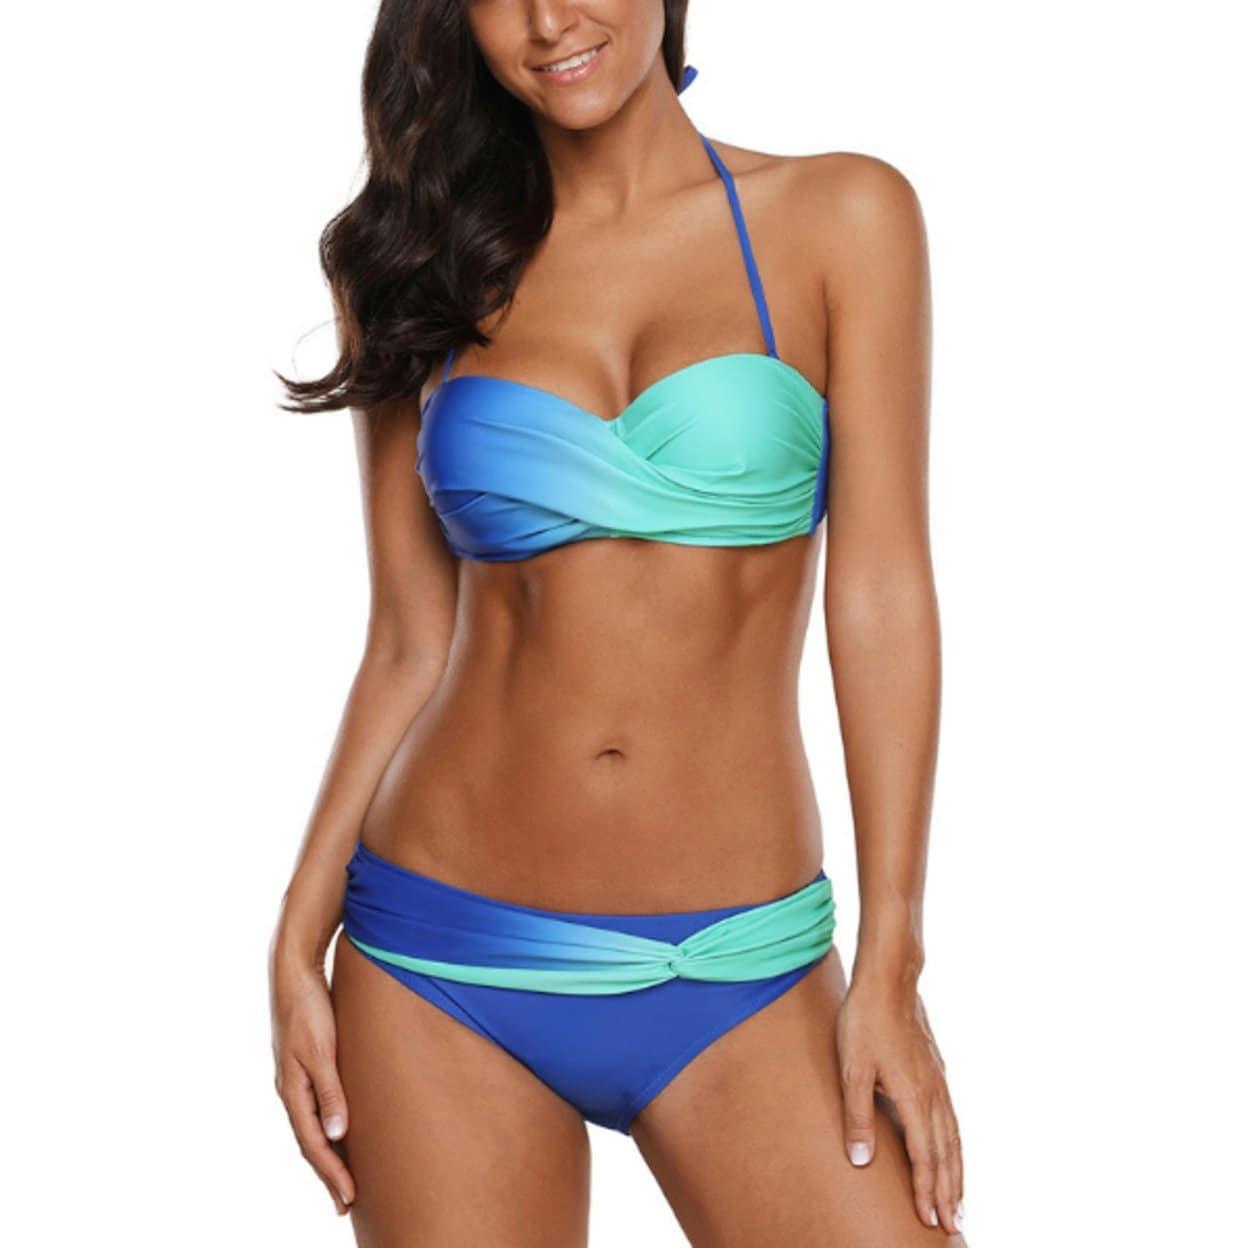 81cd72d7a58d3 Women Halter Bikini Sets Cross Padded Two Piece Swimsuit Wrap Bathing Suits